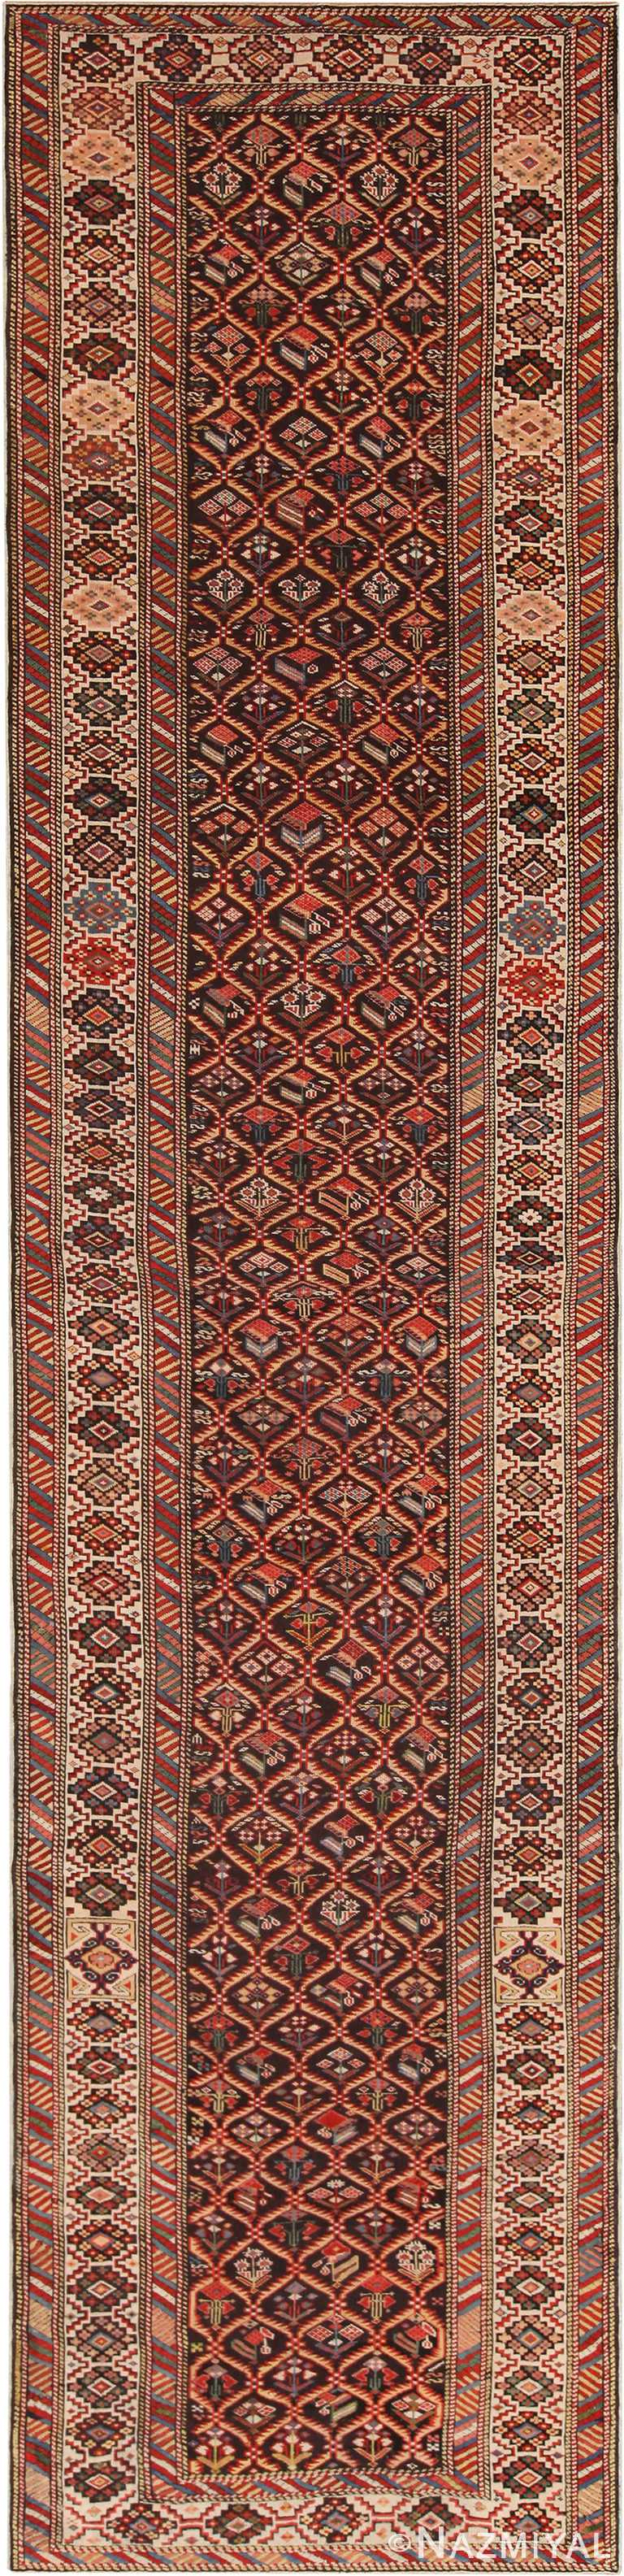 Tribal Antique Caucasian Shirvan Runner Rug 71046 by Nazmiyal Antique Rugs